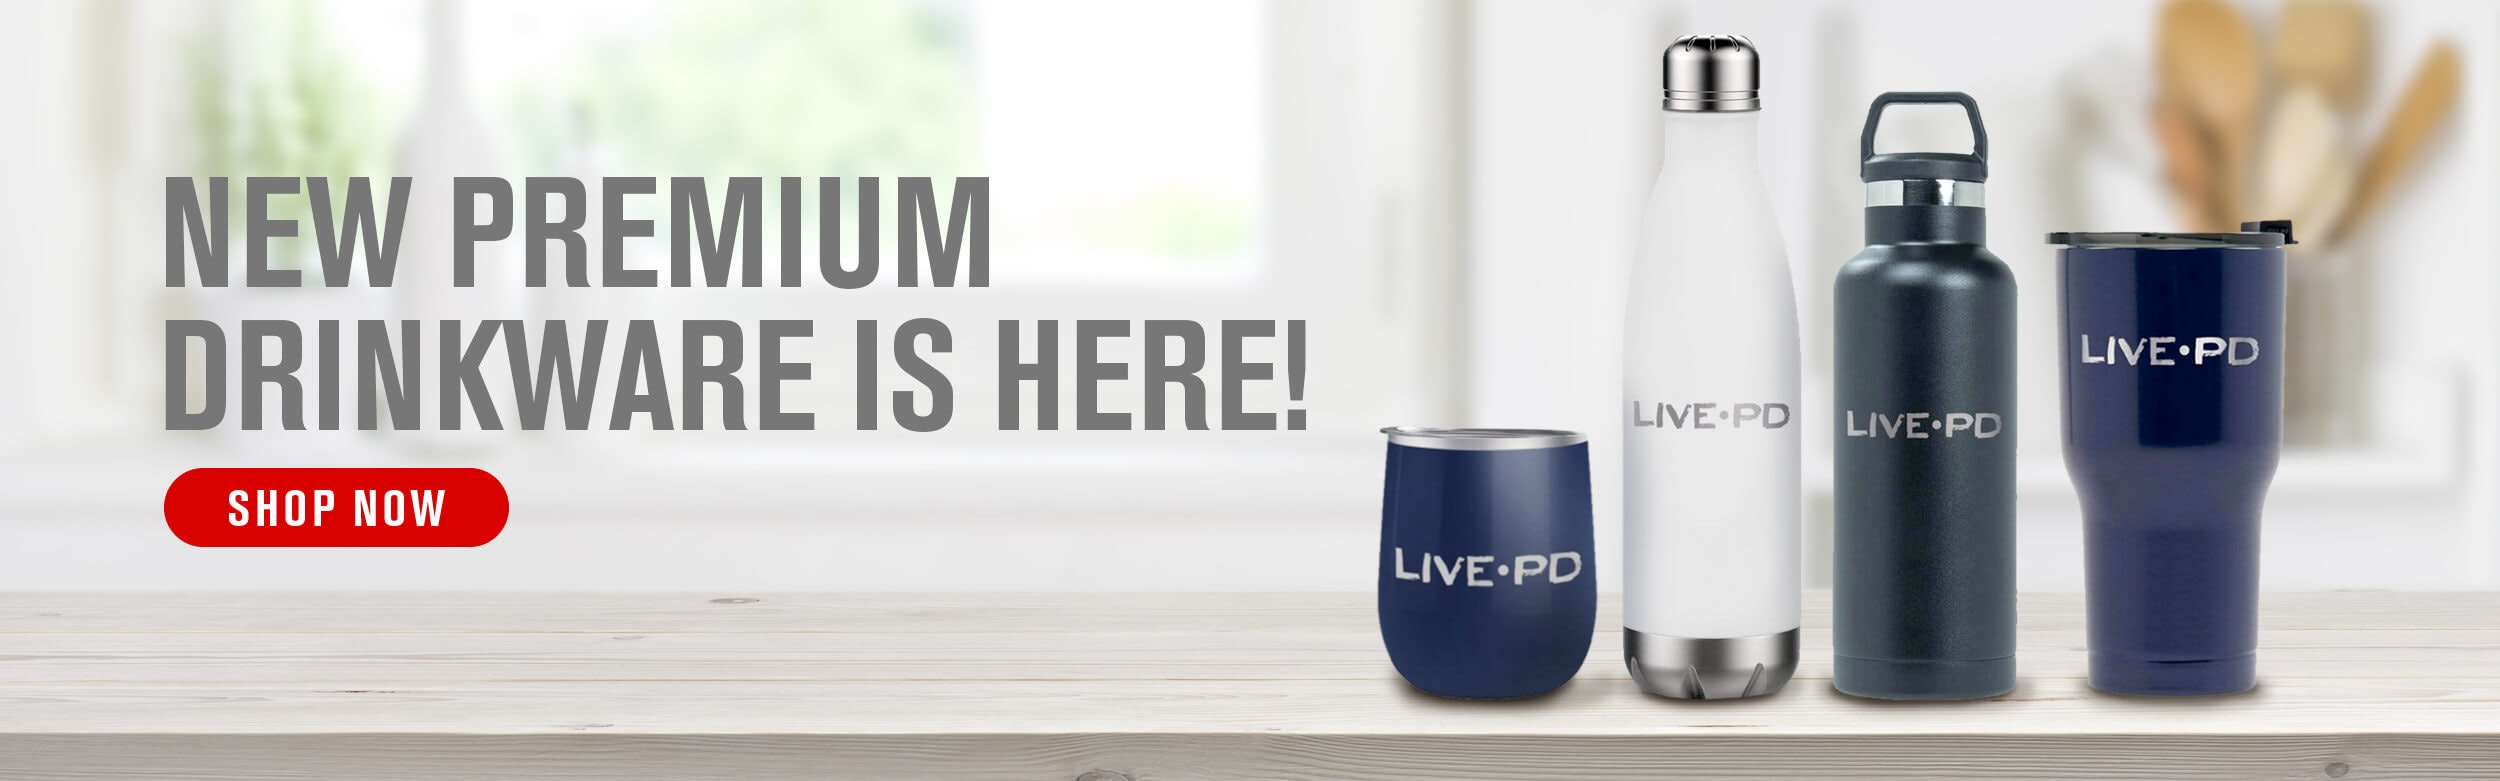 LIVE PD Drinkware